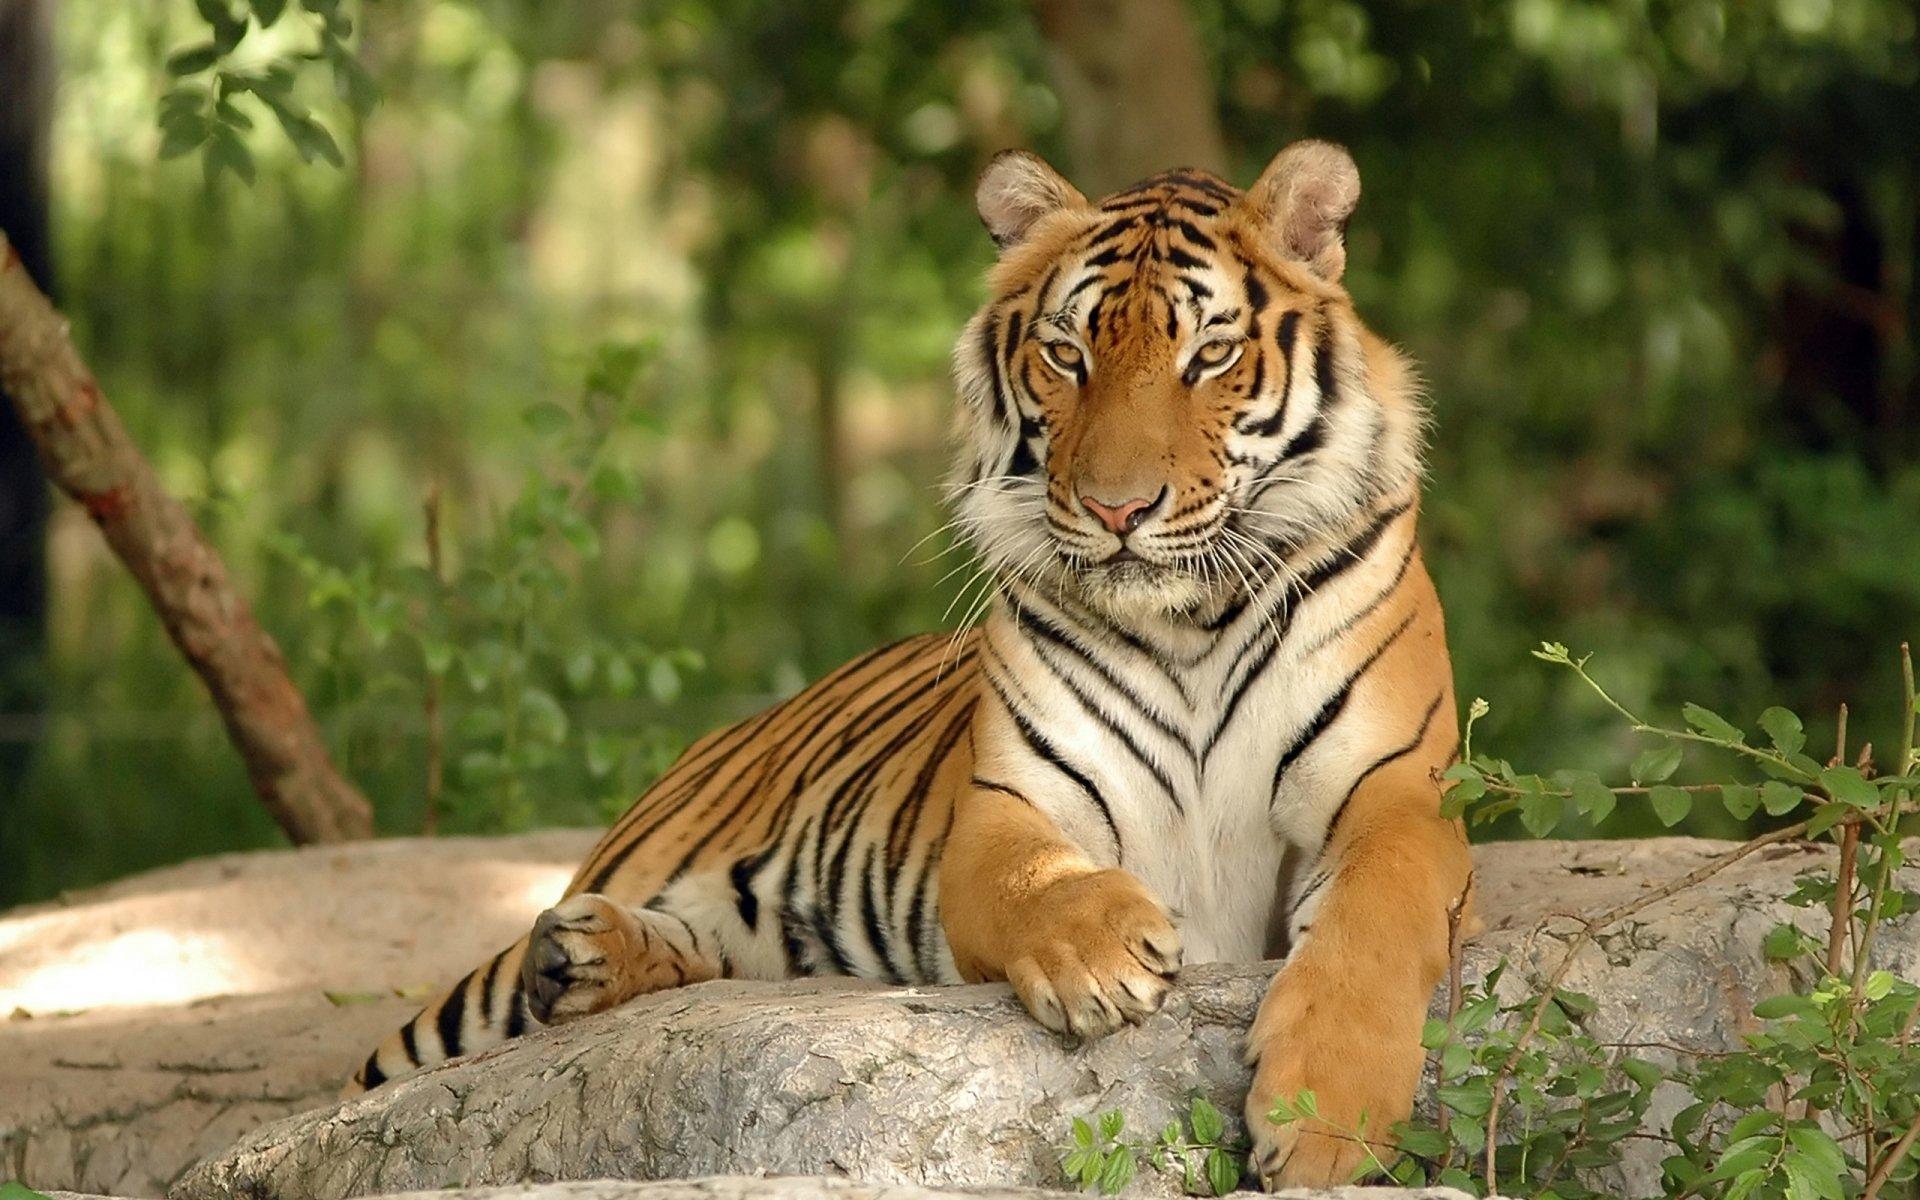 Hd Tiger Pictures Tiger Wallpapers: Tiger HD Wallpaper